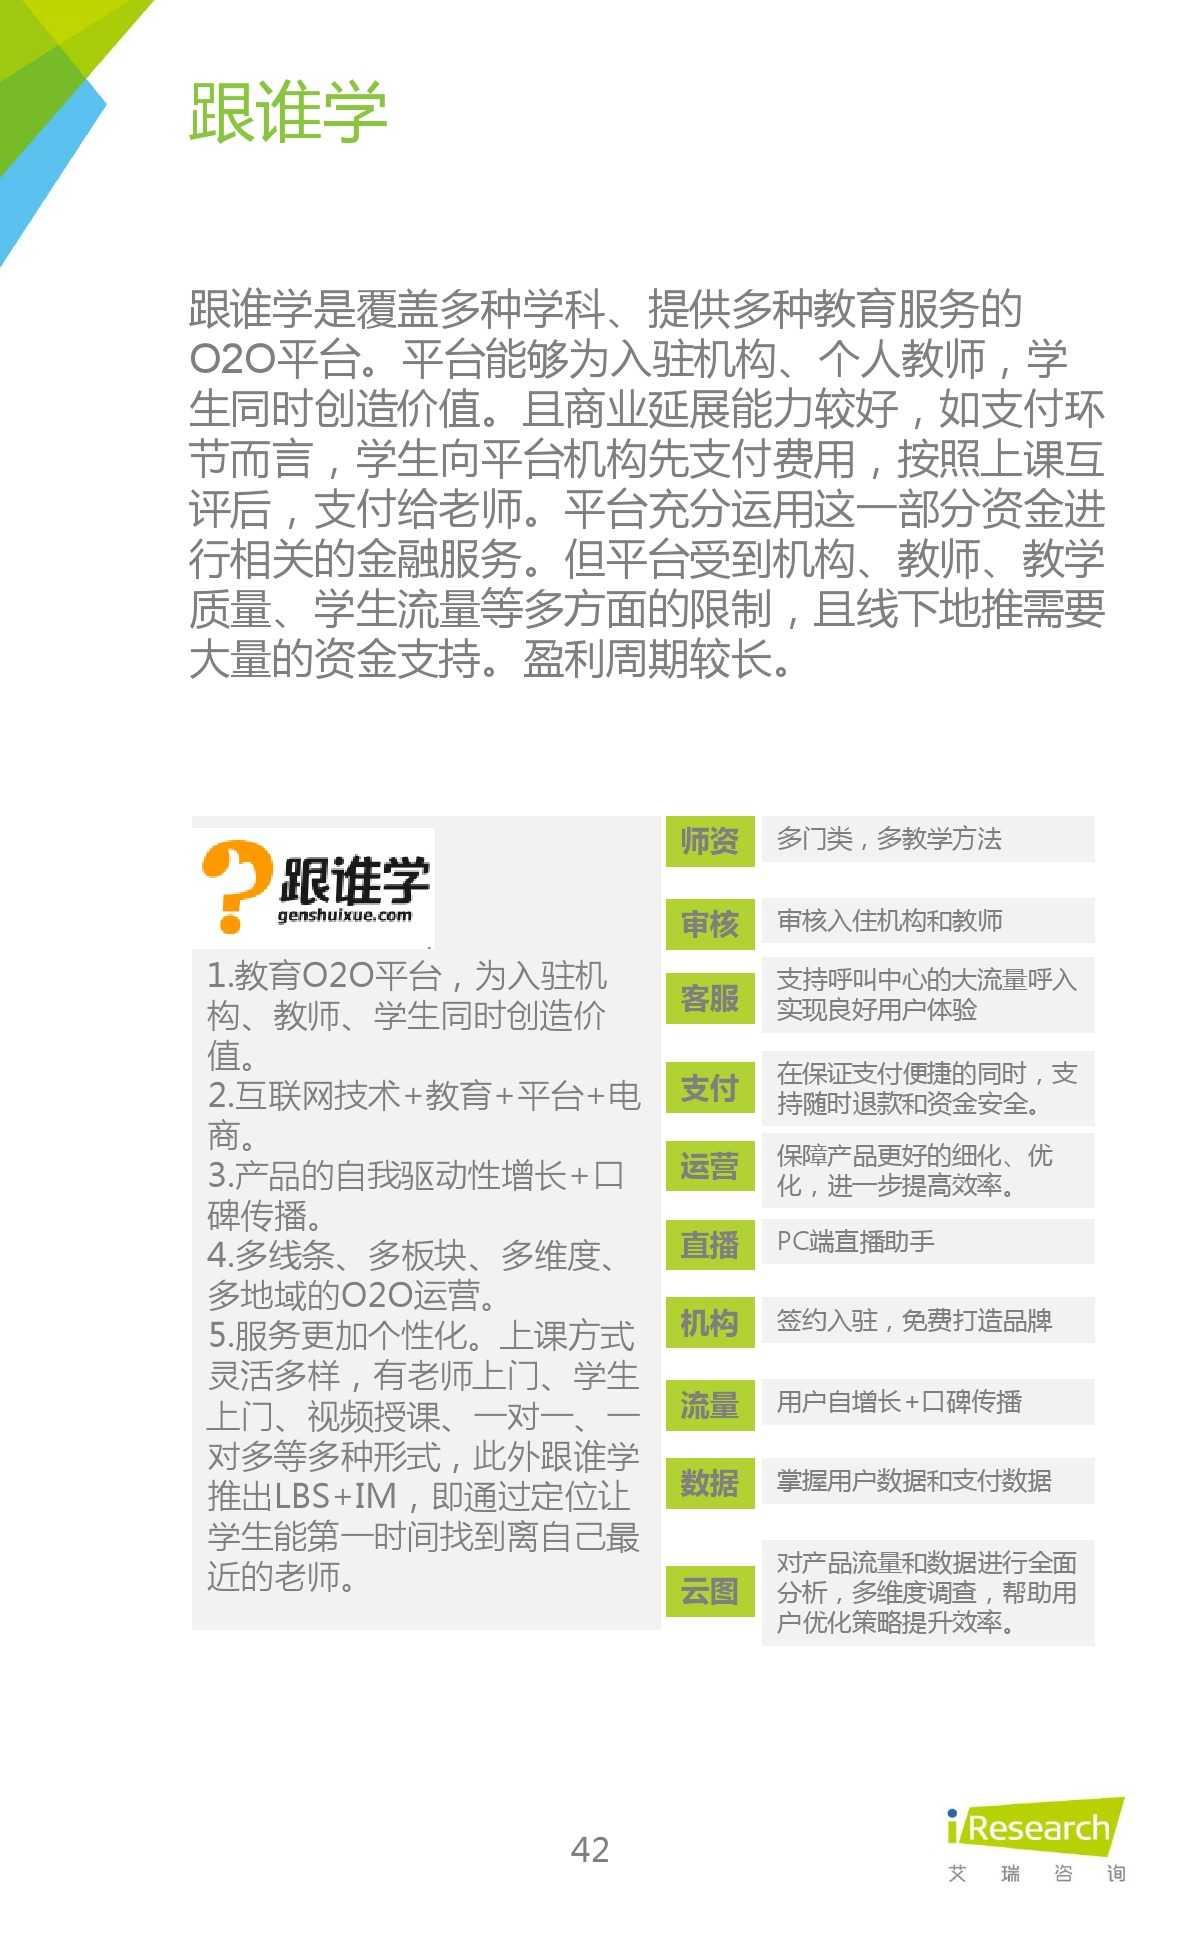 iResearch-2015年中国在线教育平台研究报告_000042